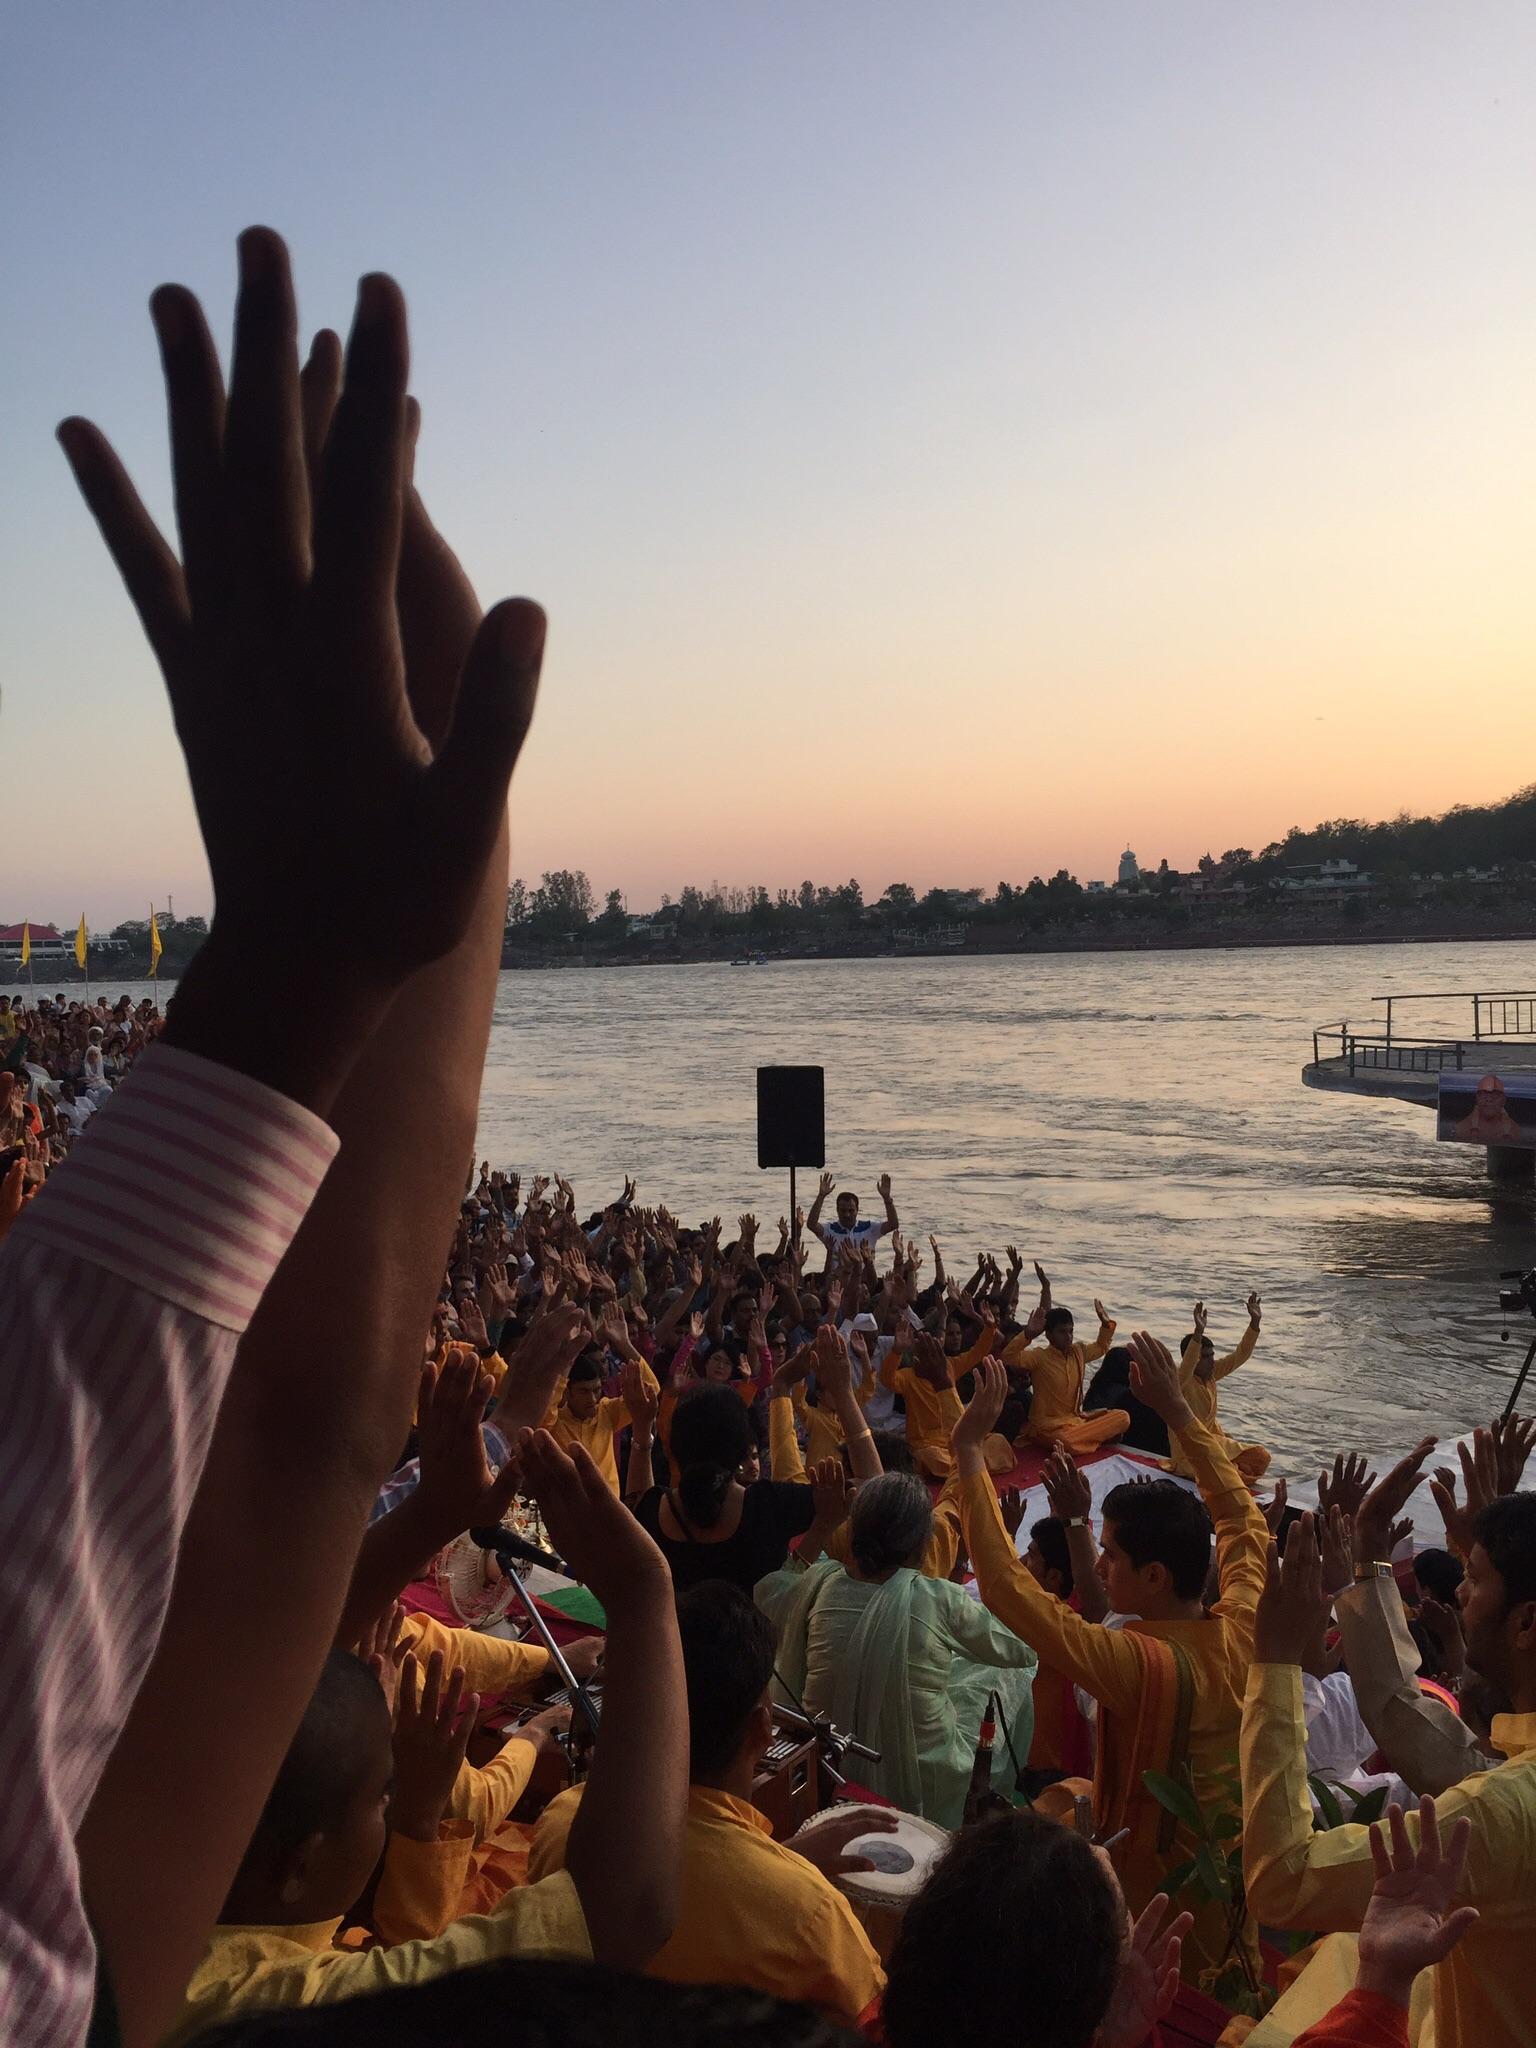 A Hindu celebration at sunset. Shanti shanti.